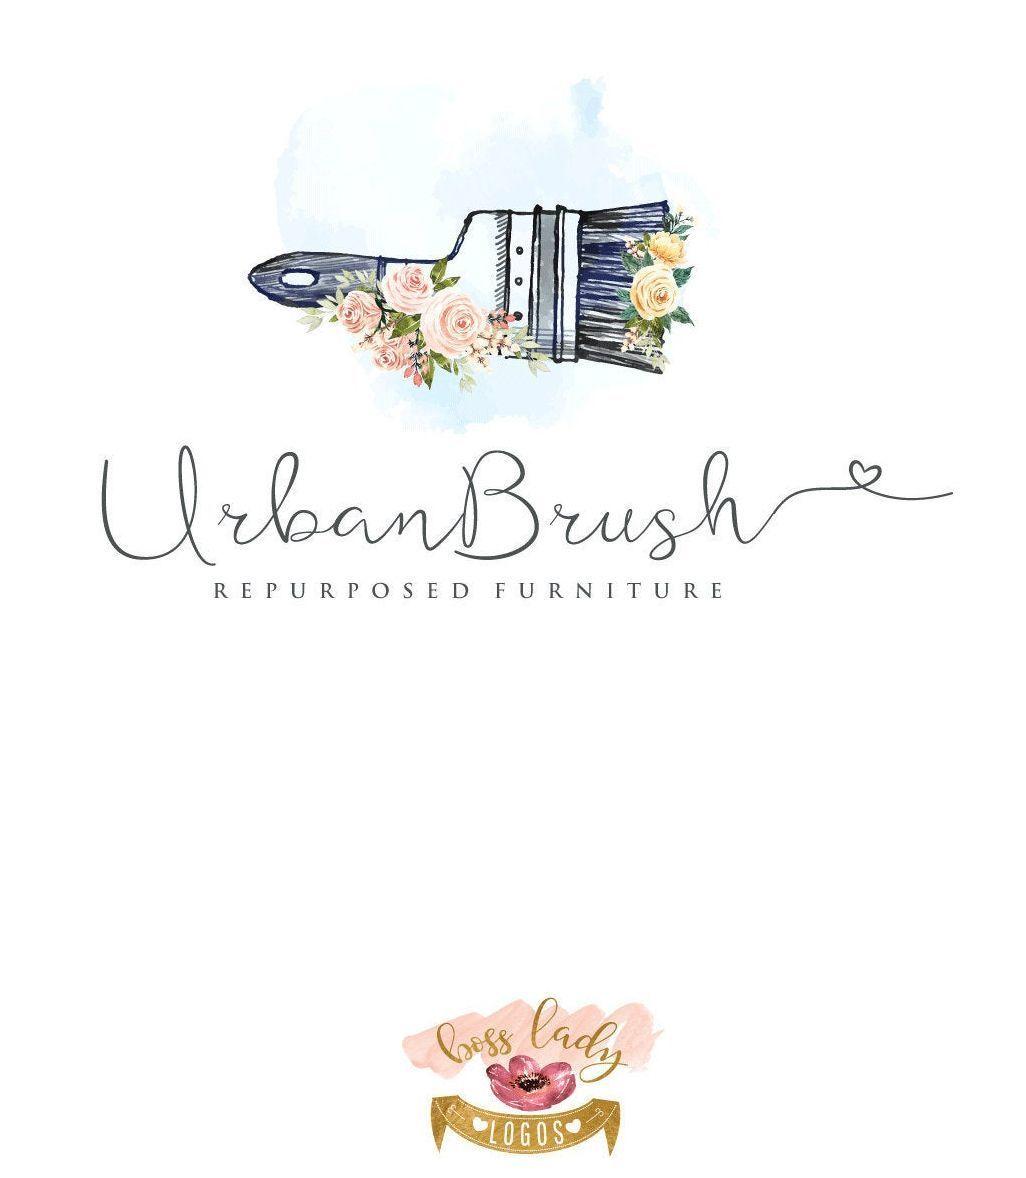 Paint Brush Logo Painting Logo Refurbished Furniture Logo Painter Logo Flora  Paint Brush Logo Painting Logo Refurbished Furniture Logo Painter Logo Floral Refinished Fur...